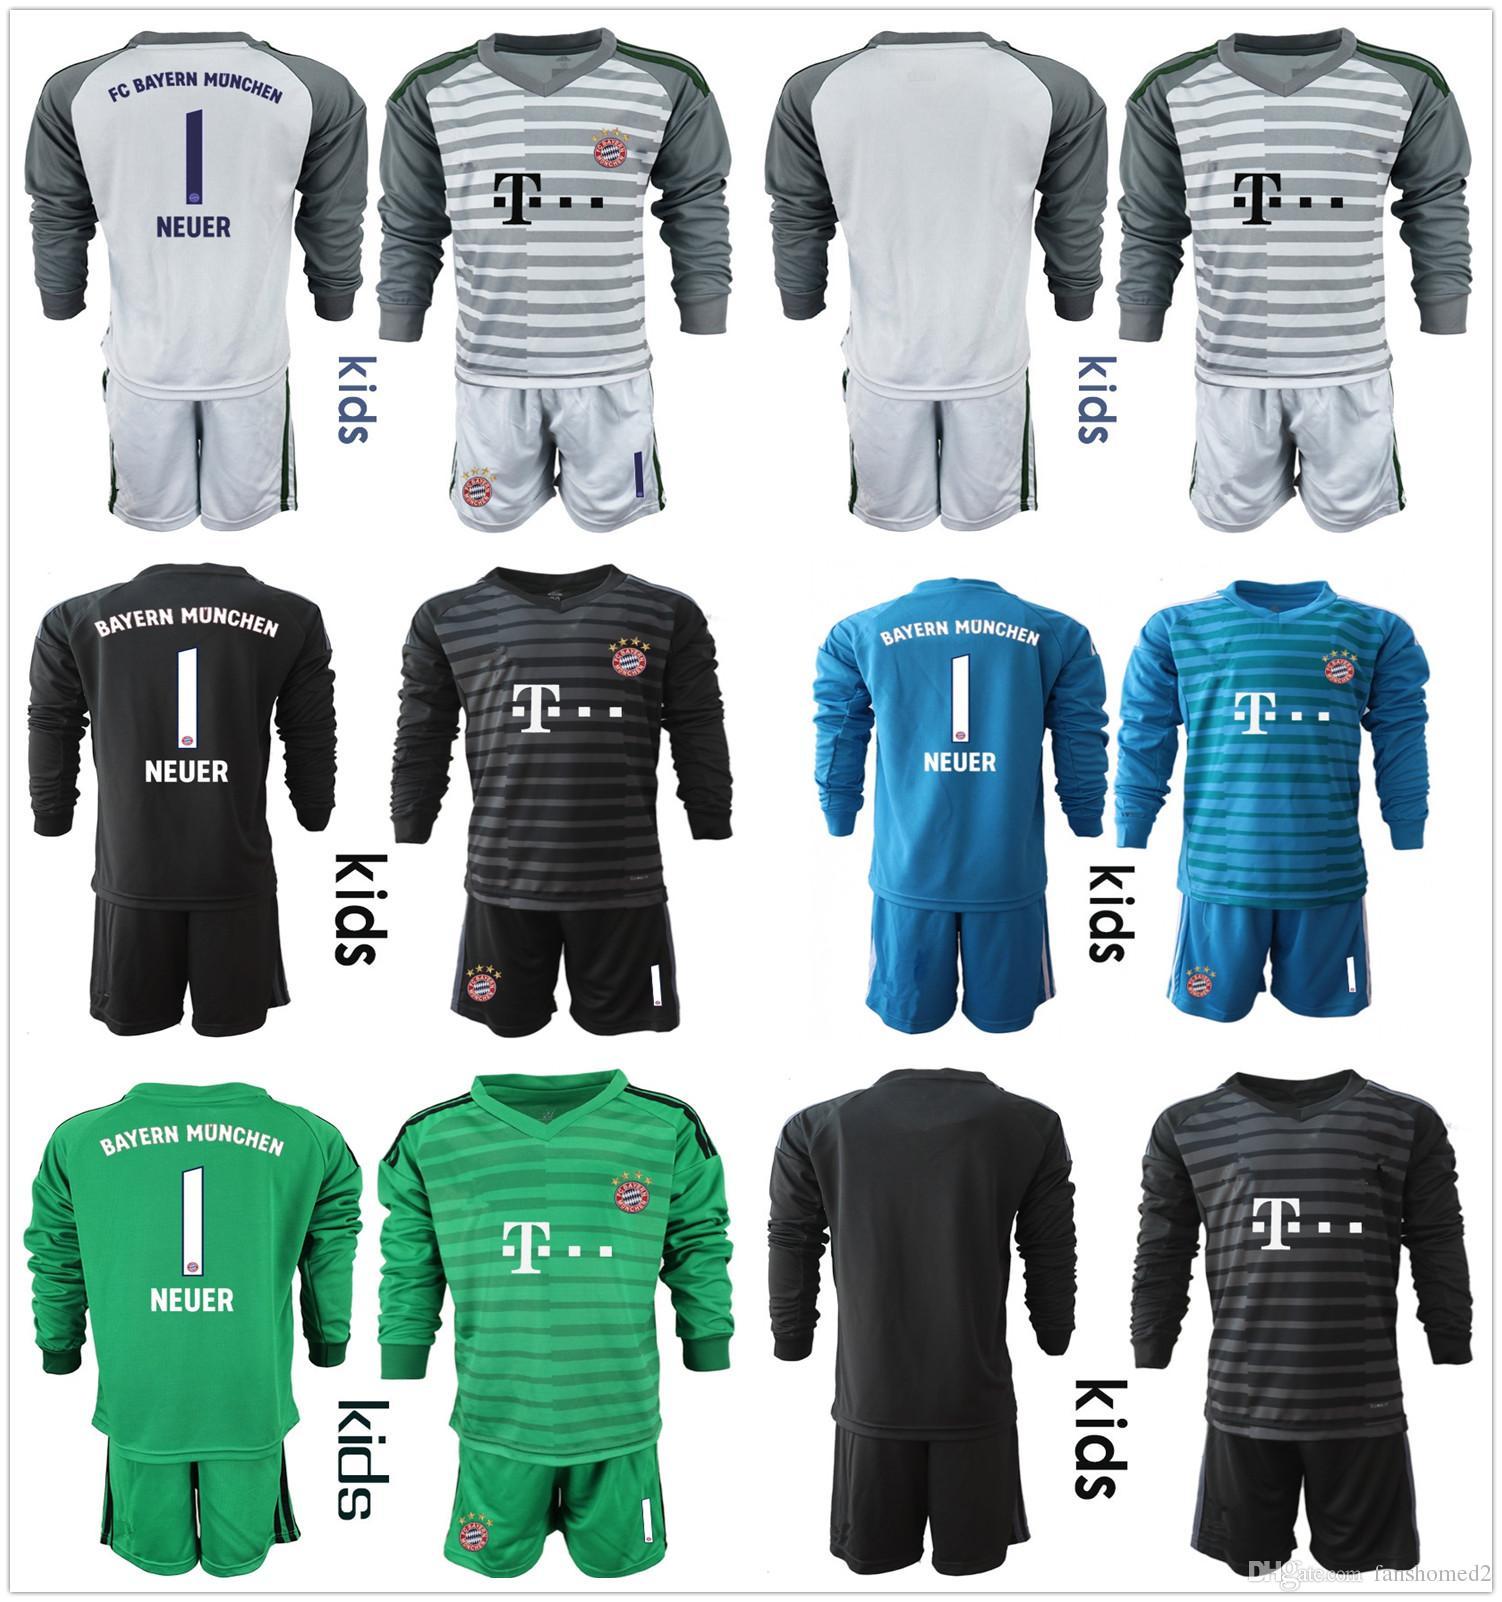 Compre 2018 2019 Crianças Manga Longa NEUER Goleiro Jersey Kit Conjuntos De  Futebol De Juventude   1 Manuel Neuer   26 Ulreich Hoffmann Kits De Futebol  KID ... 5dfeebc29b92c